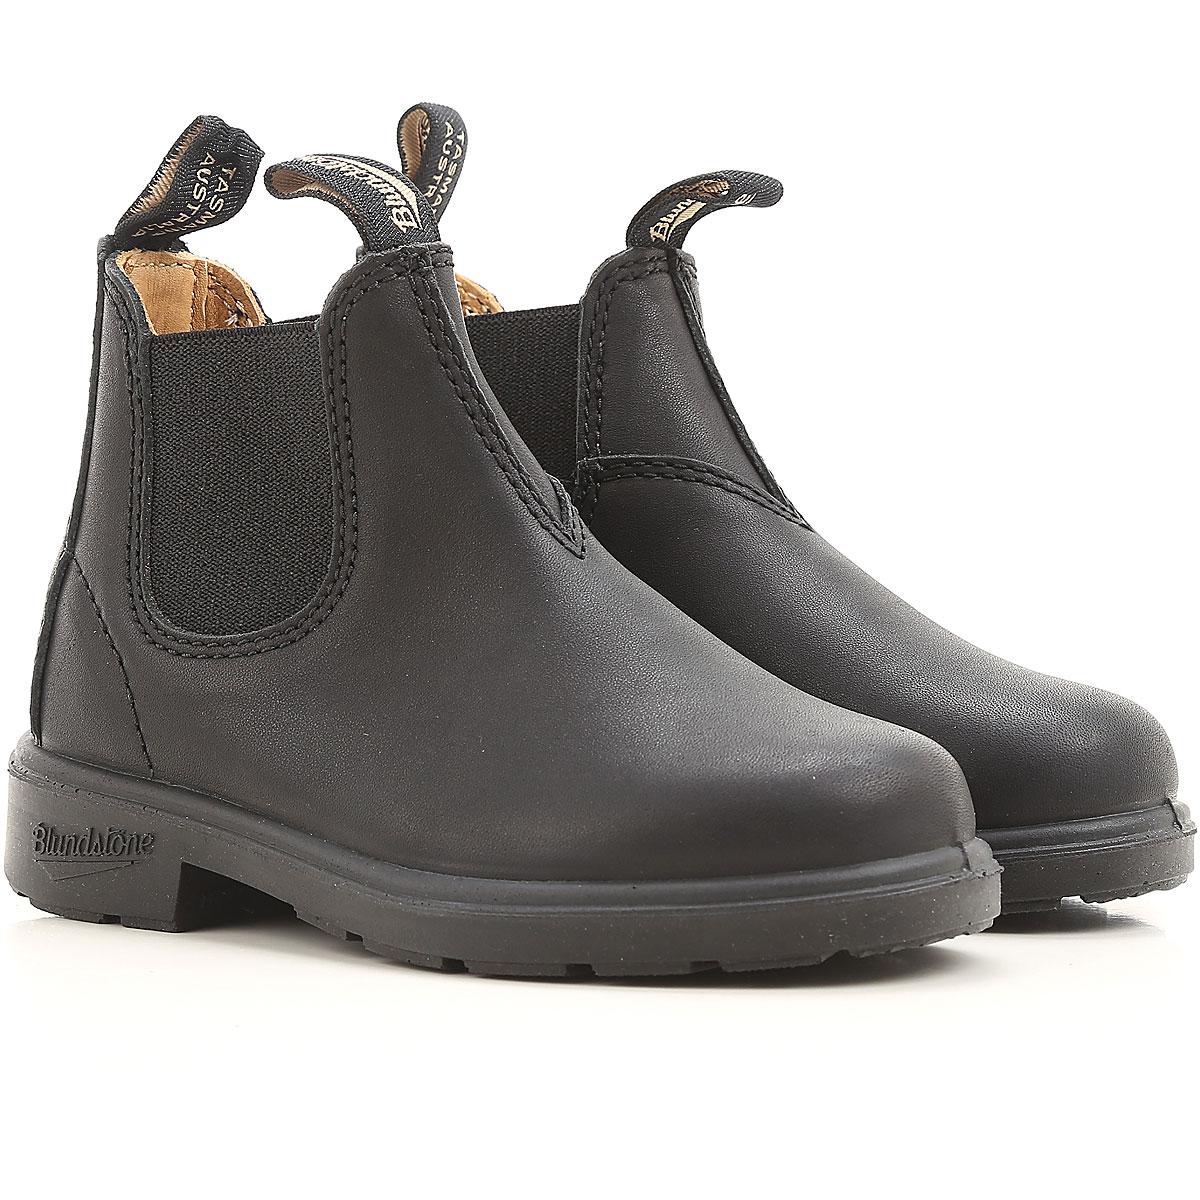 Image of Blundstone Kids Shoes for Boys, Black, Leather, 2017, UK 8 - US 8.5 - EU 25.5 UK 9 - US 9.5 - EU 26.5 UK 10 - US 10.5 - EU 28 UK 11 - UK 11.5 - EU 29 UK 12 - US 12.5 - EU 30.5 UK 13 - US 13.5 - EU 32